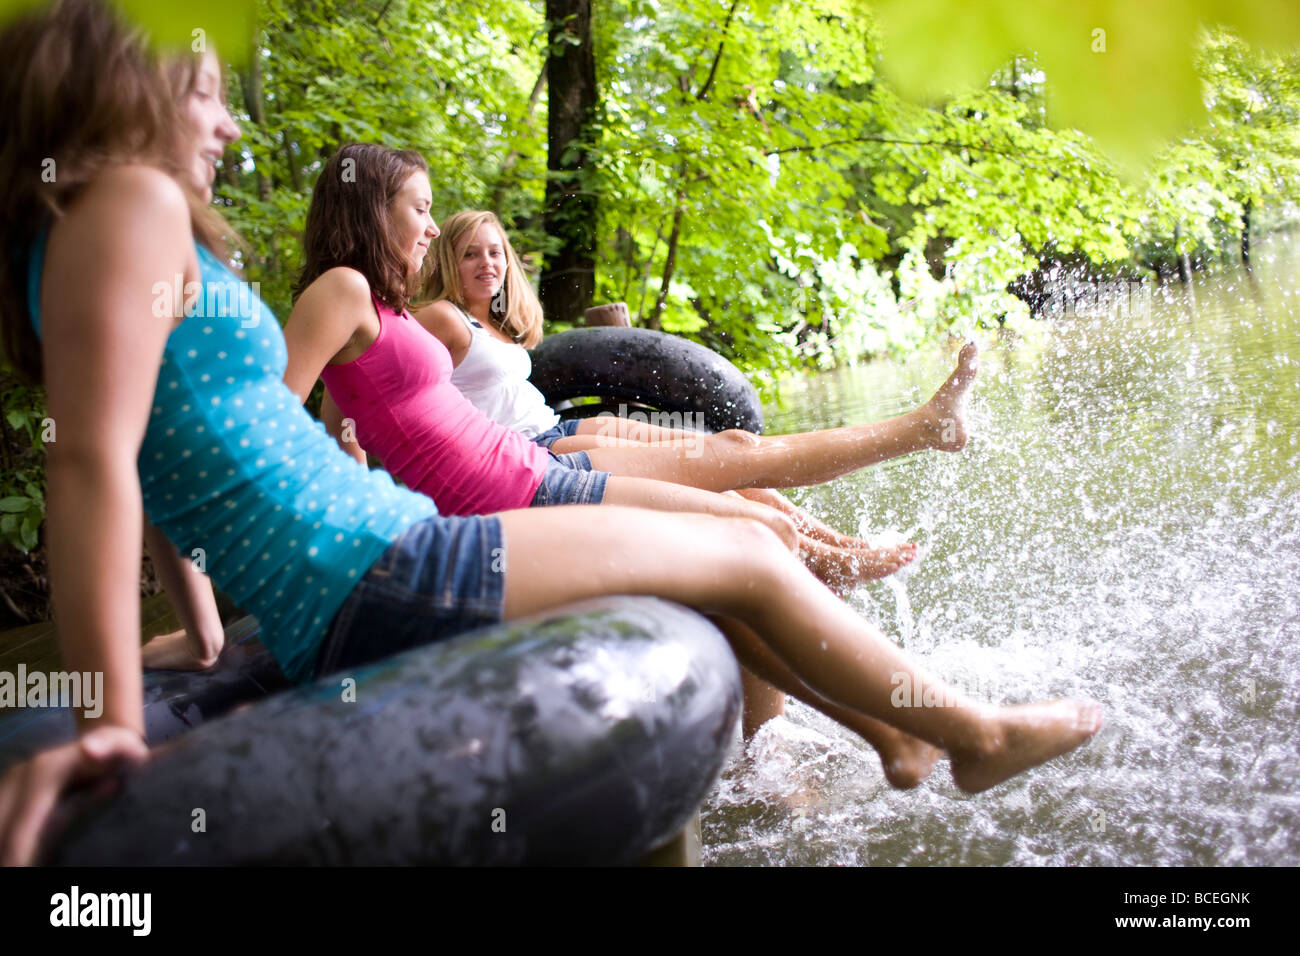 Teenage girls sitting in innertubes and splashing water - Stock Image